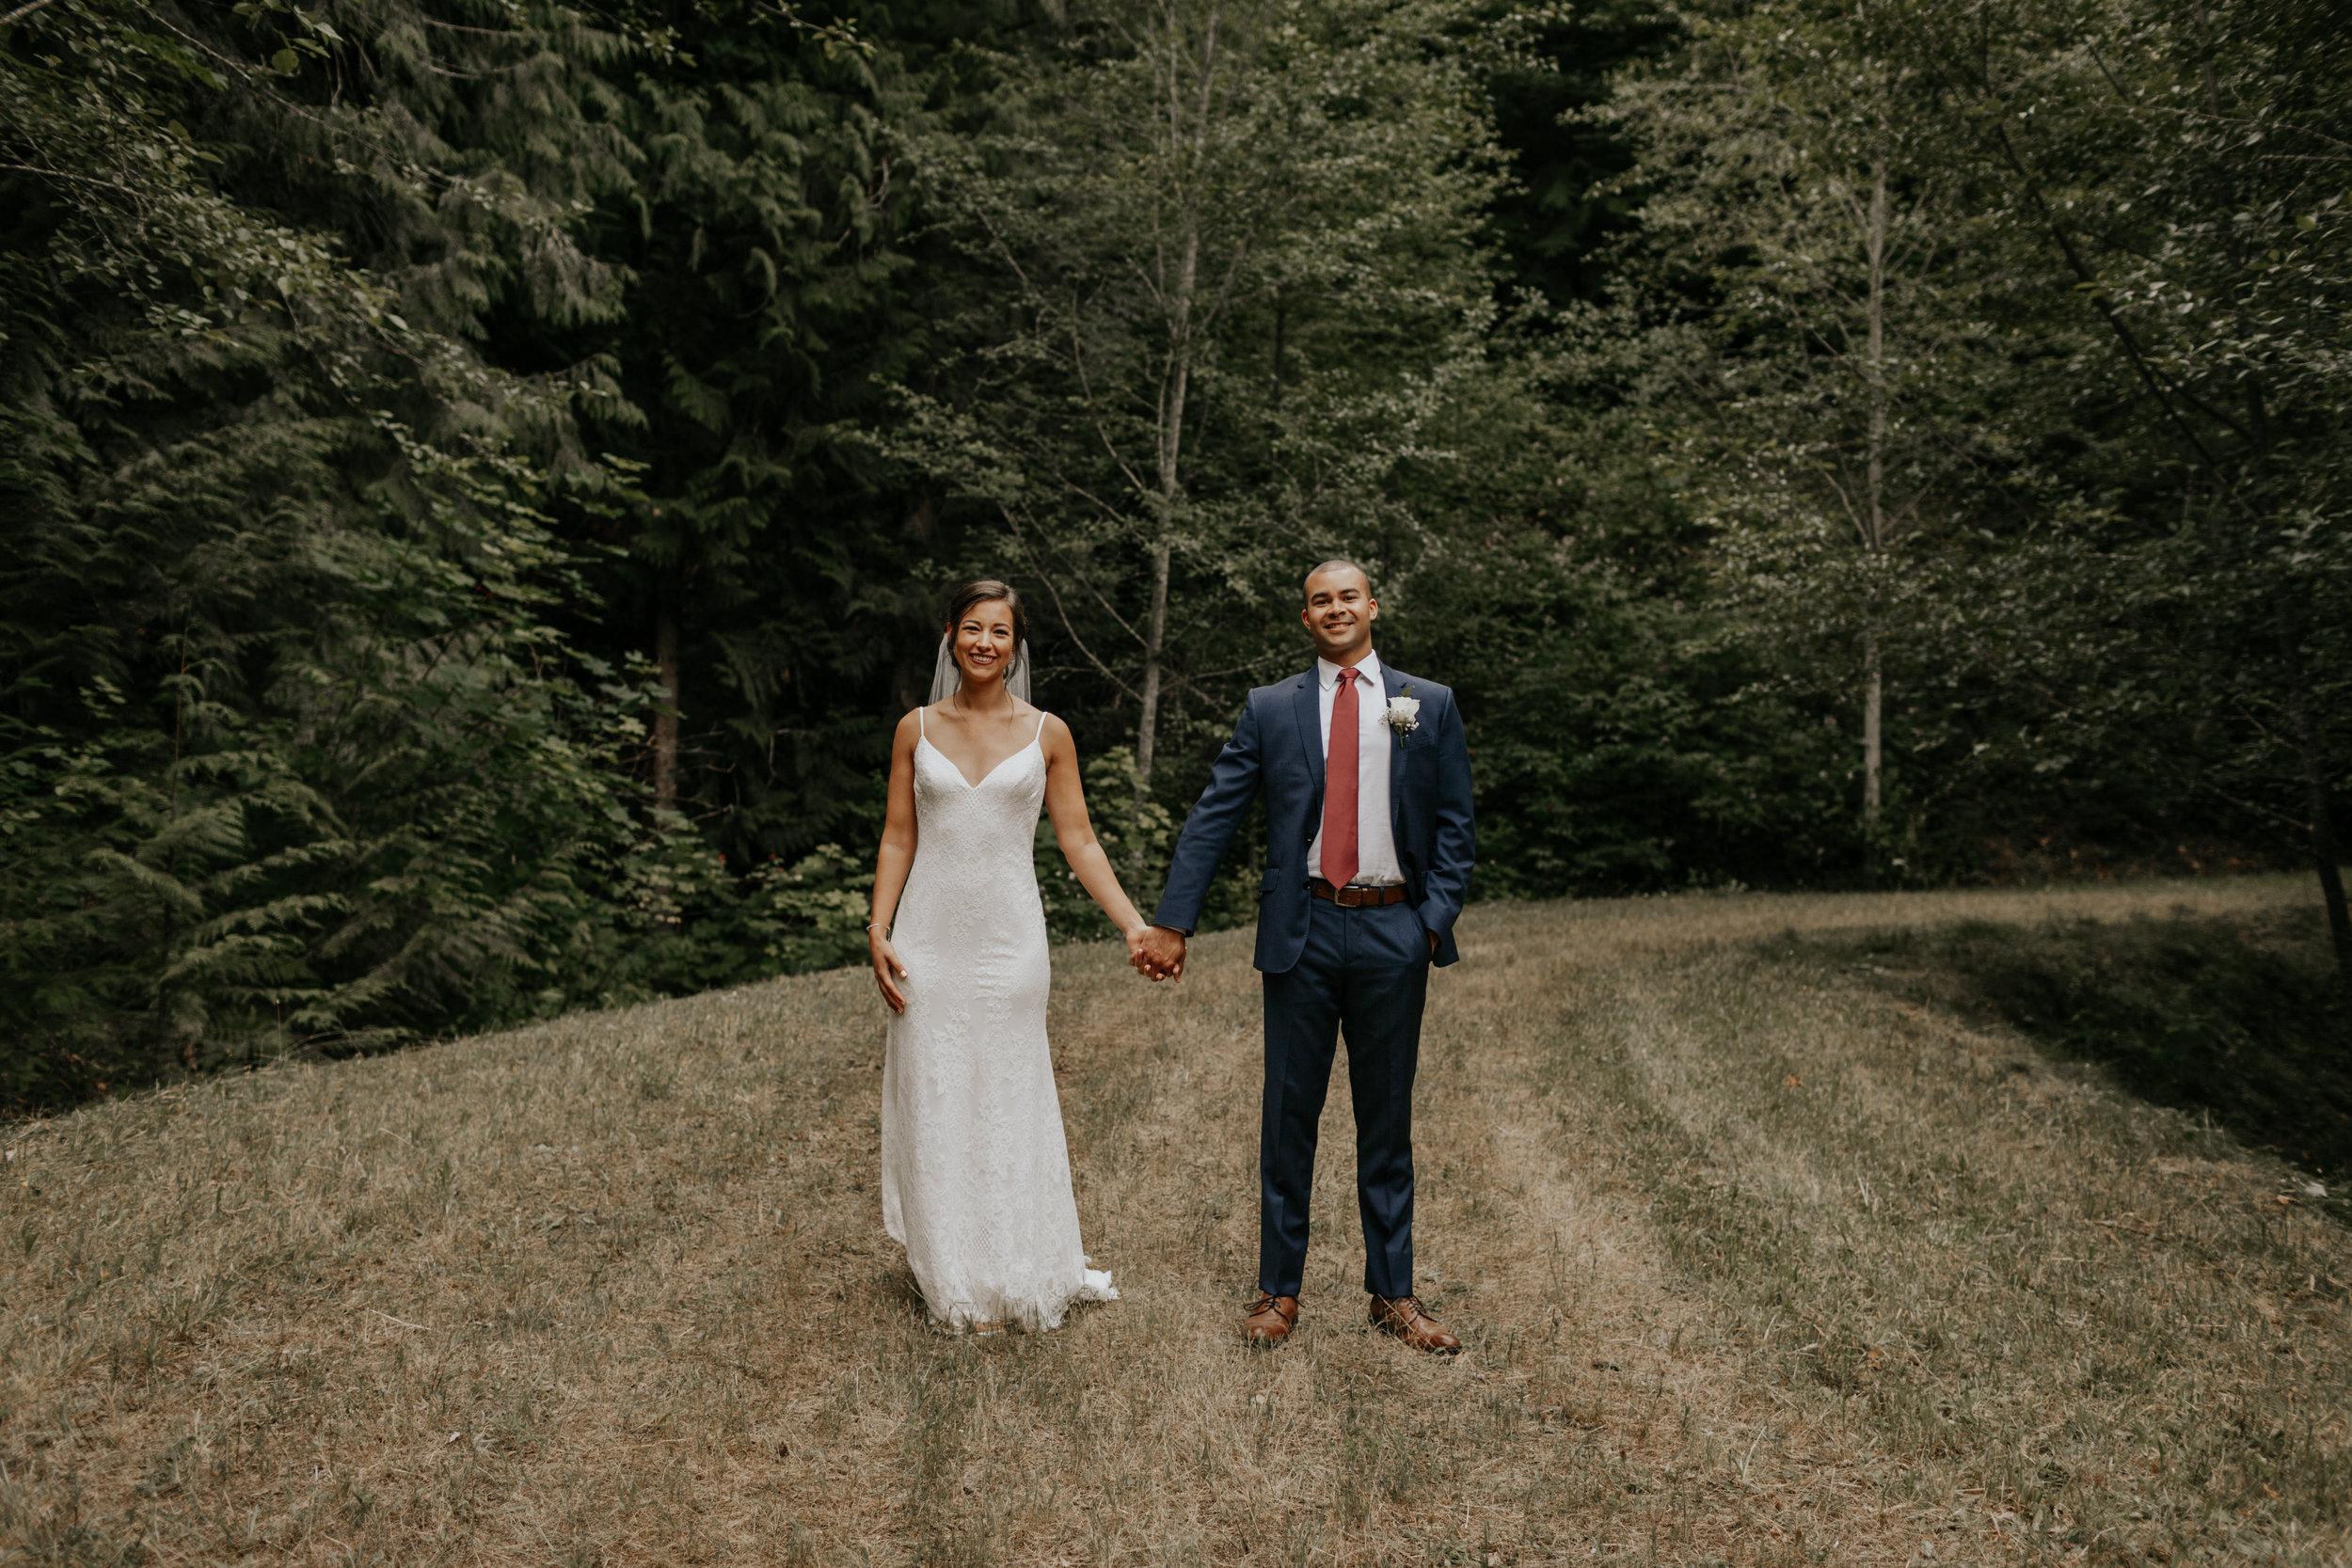 ginapaulson_aubreejeff_wedding-164.jpg